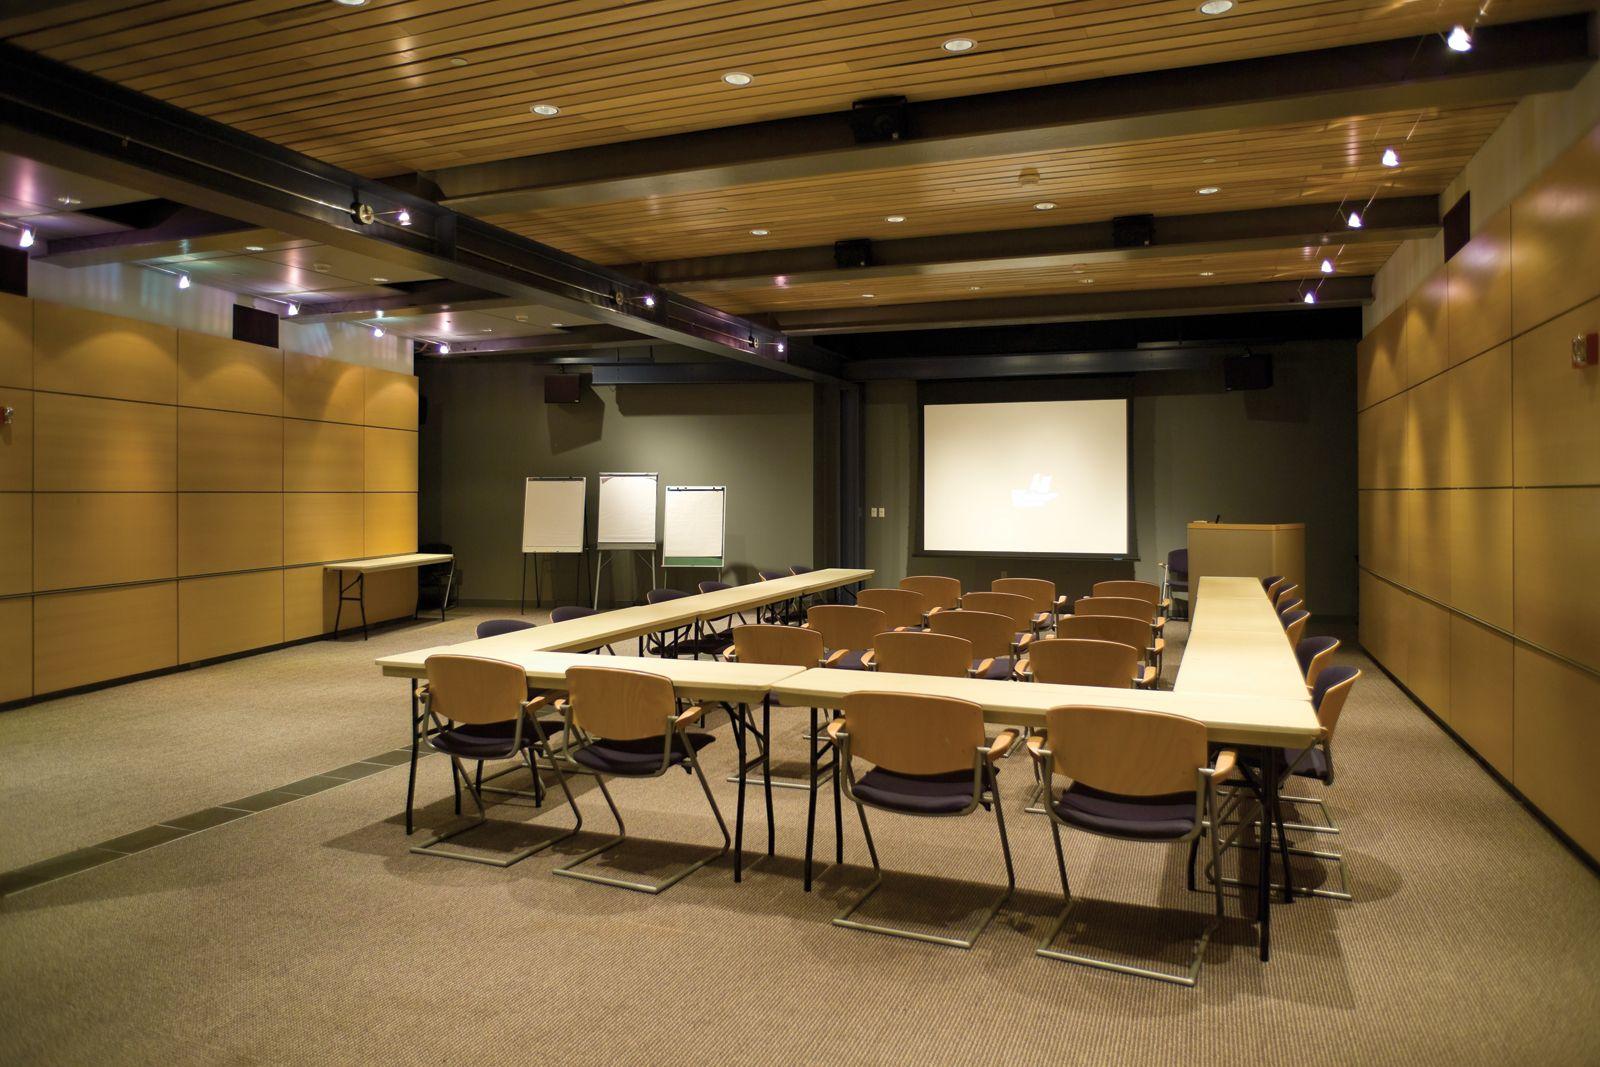 Seminar Room Rakow Library Corning Museum Of Glass Executive Office Design Coworking Design Meeting Room